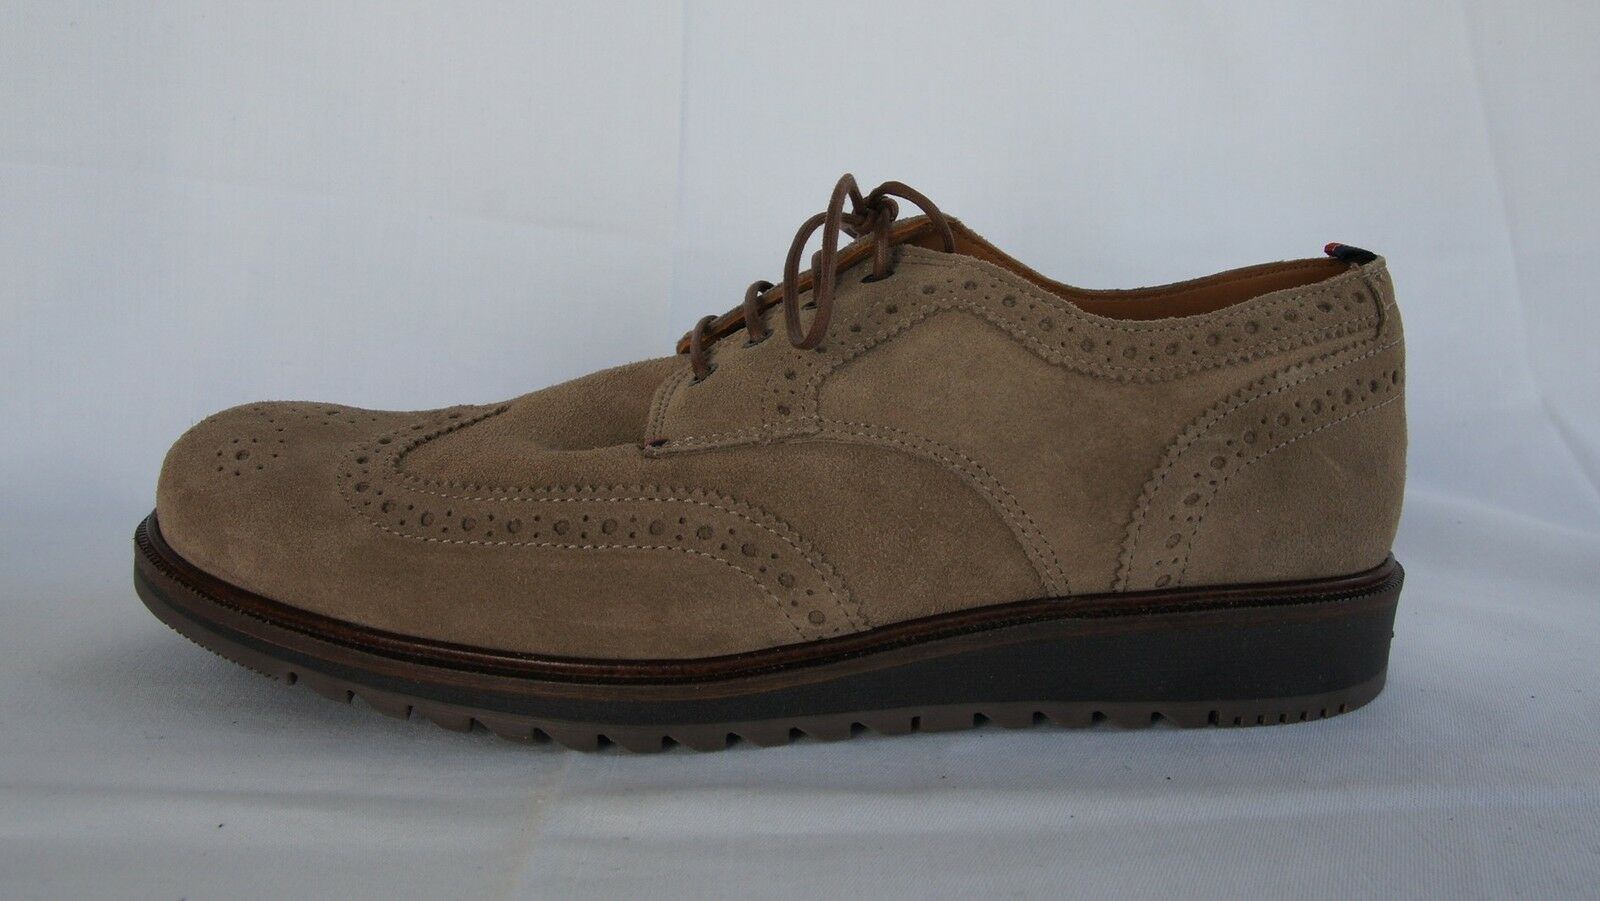 Tommy Hilfiger talla 42 caballeros schnürschuhe zapato bajo boston 2b beige PVP 160